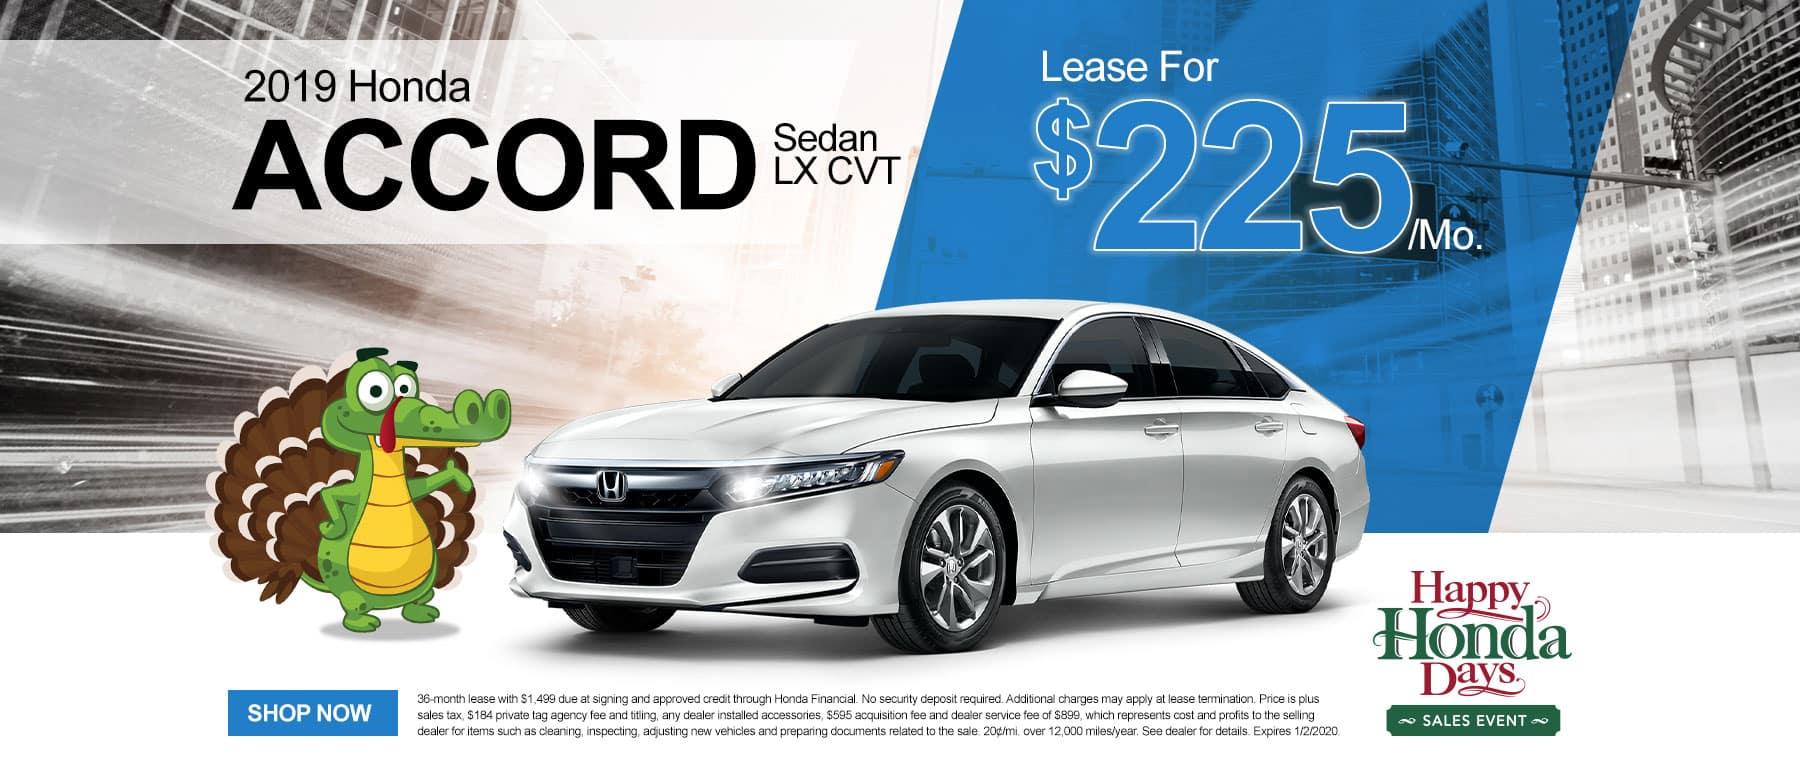 2019 Honda Accord Sedan LX CVT | Lease For $225/Mo | Happy Honda Days Sales Event